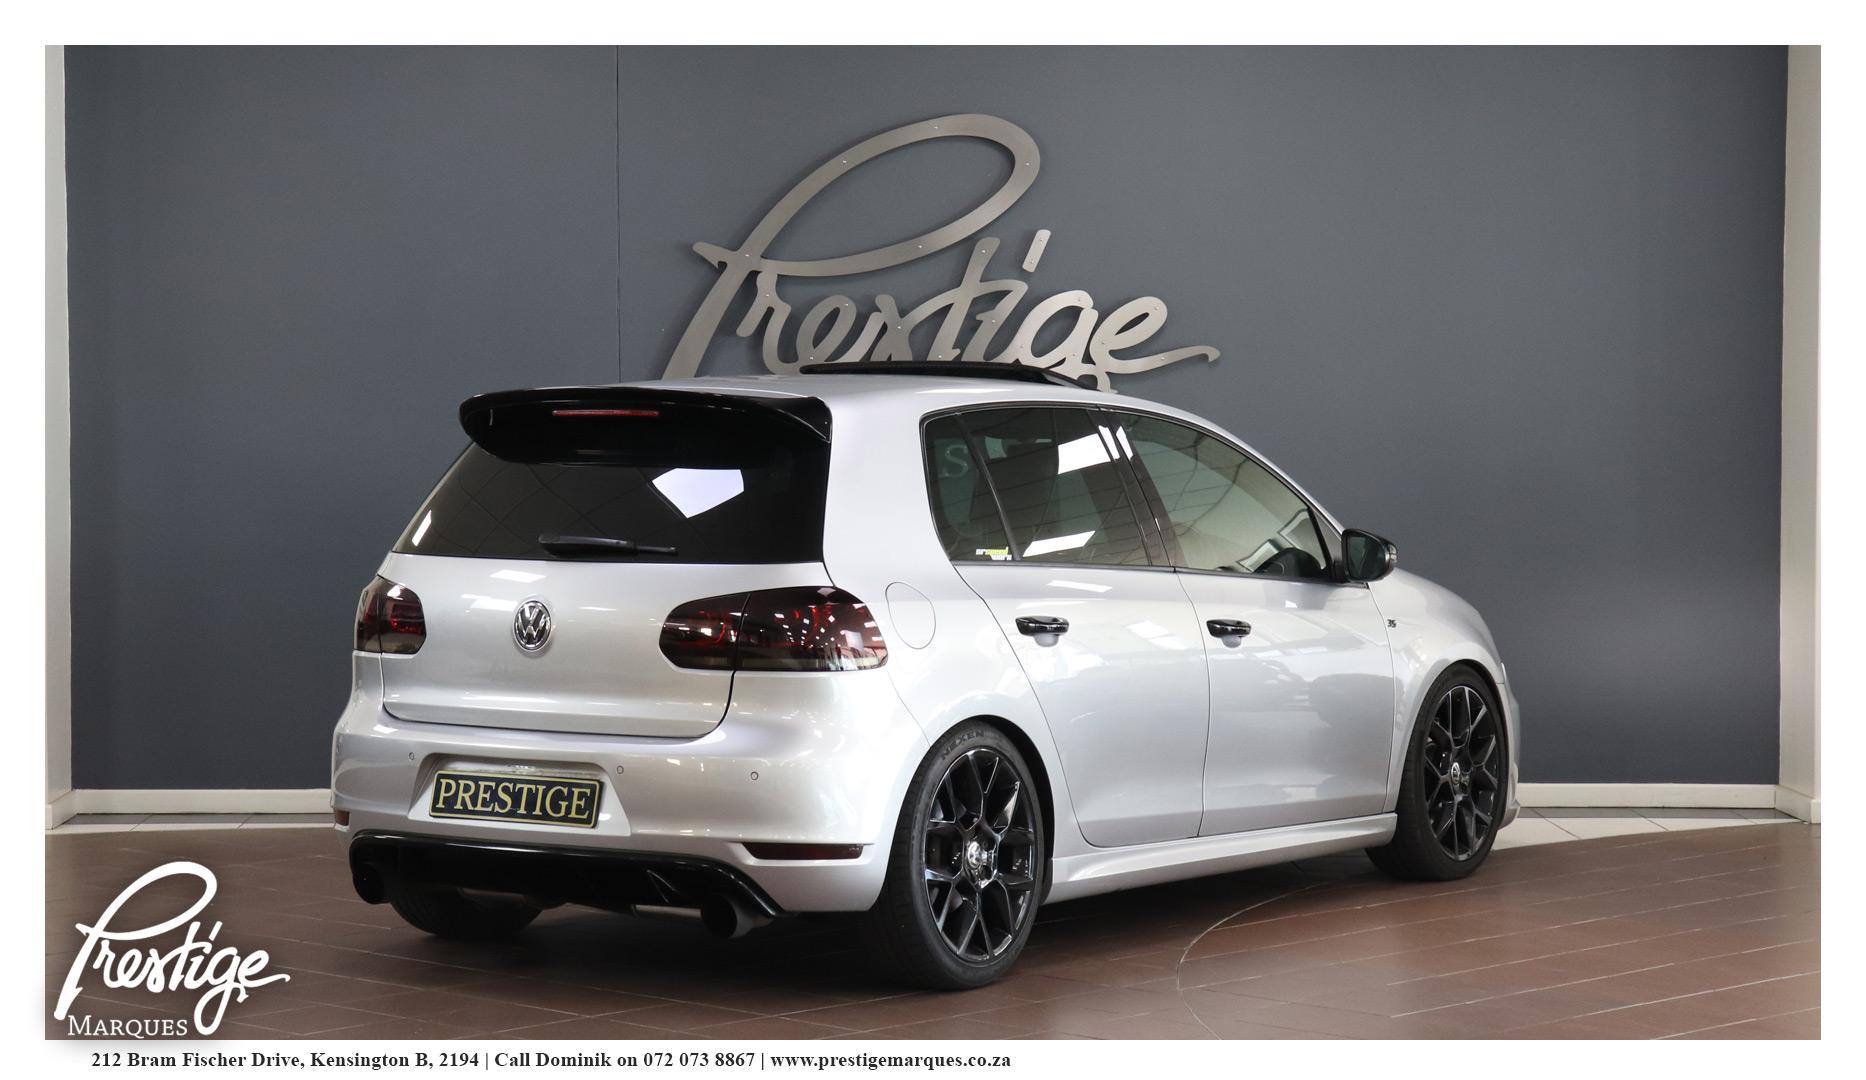 2013-Volkswagen-Golf-GTI-Ed 35-DSG-Prestige-Marques-Randburg-Sandton-4